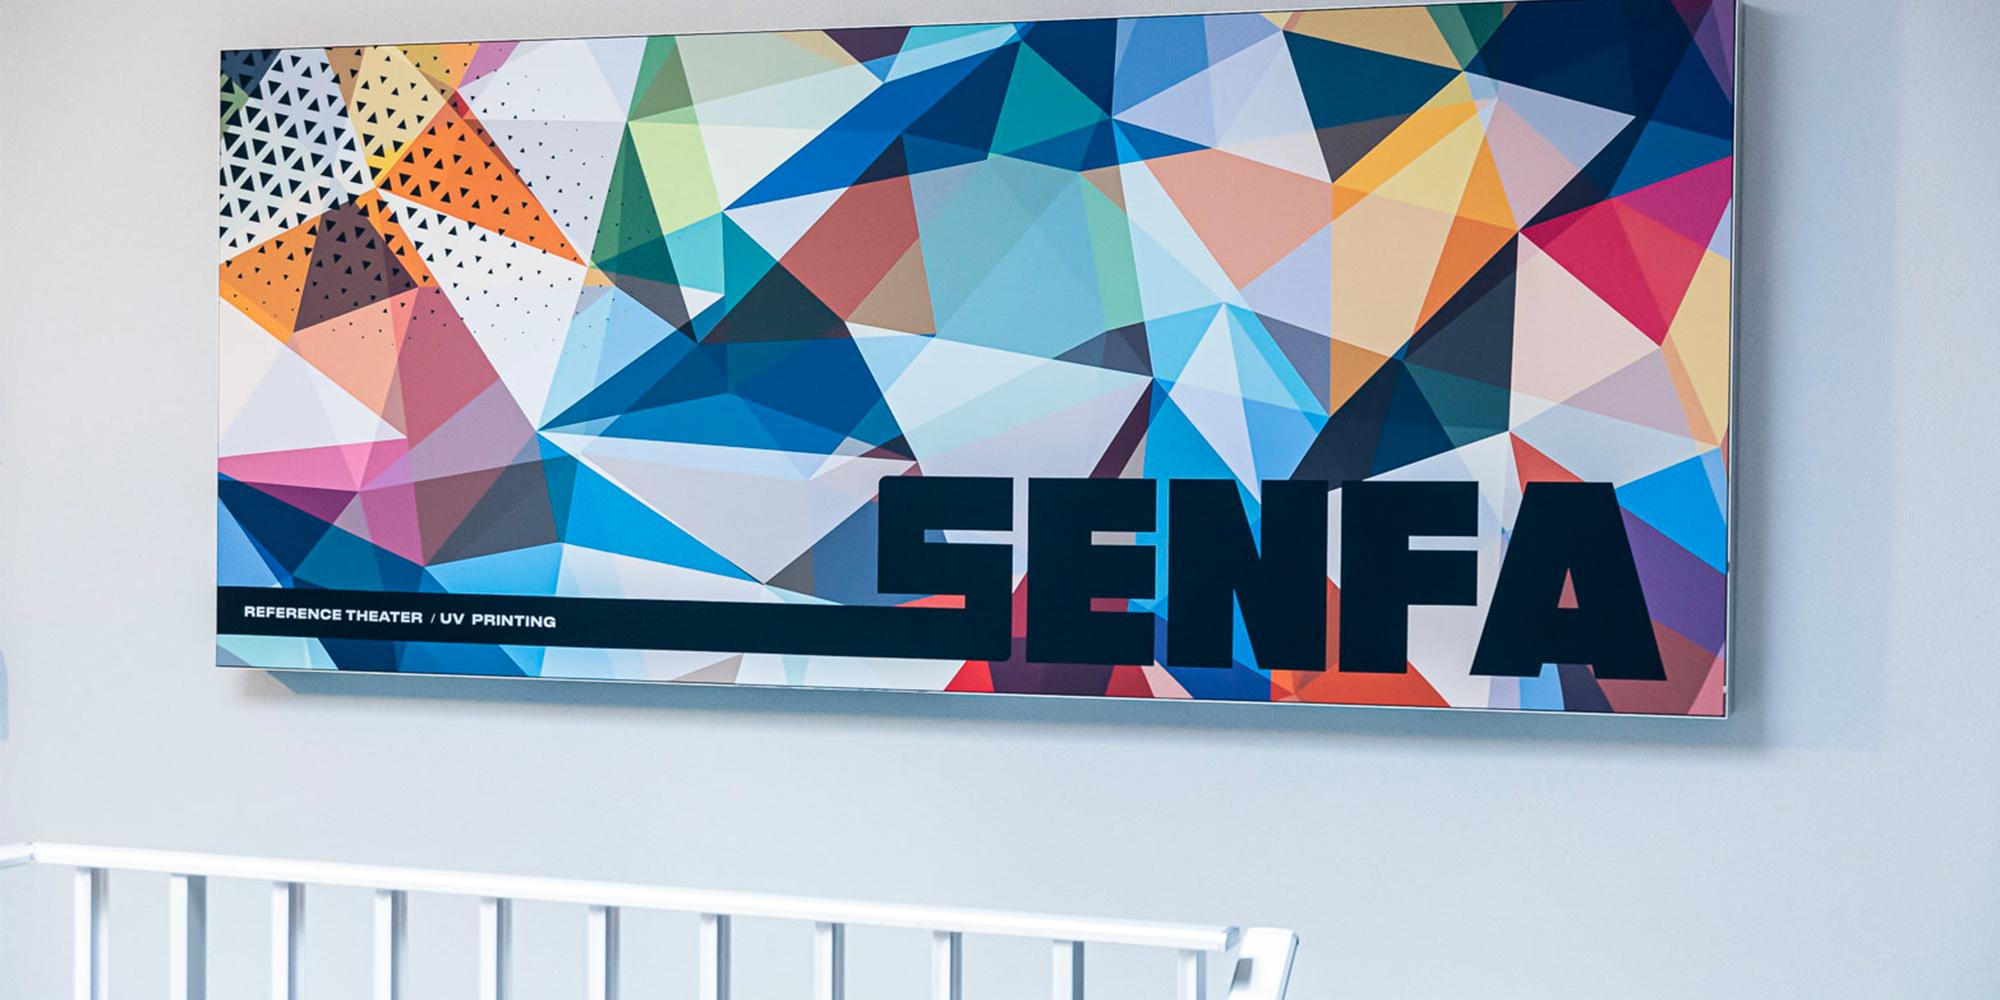 senfa frame textile theater uv printing fire retardant